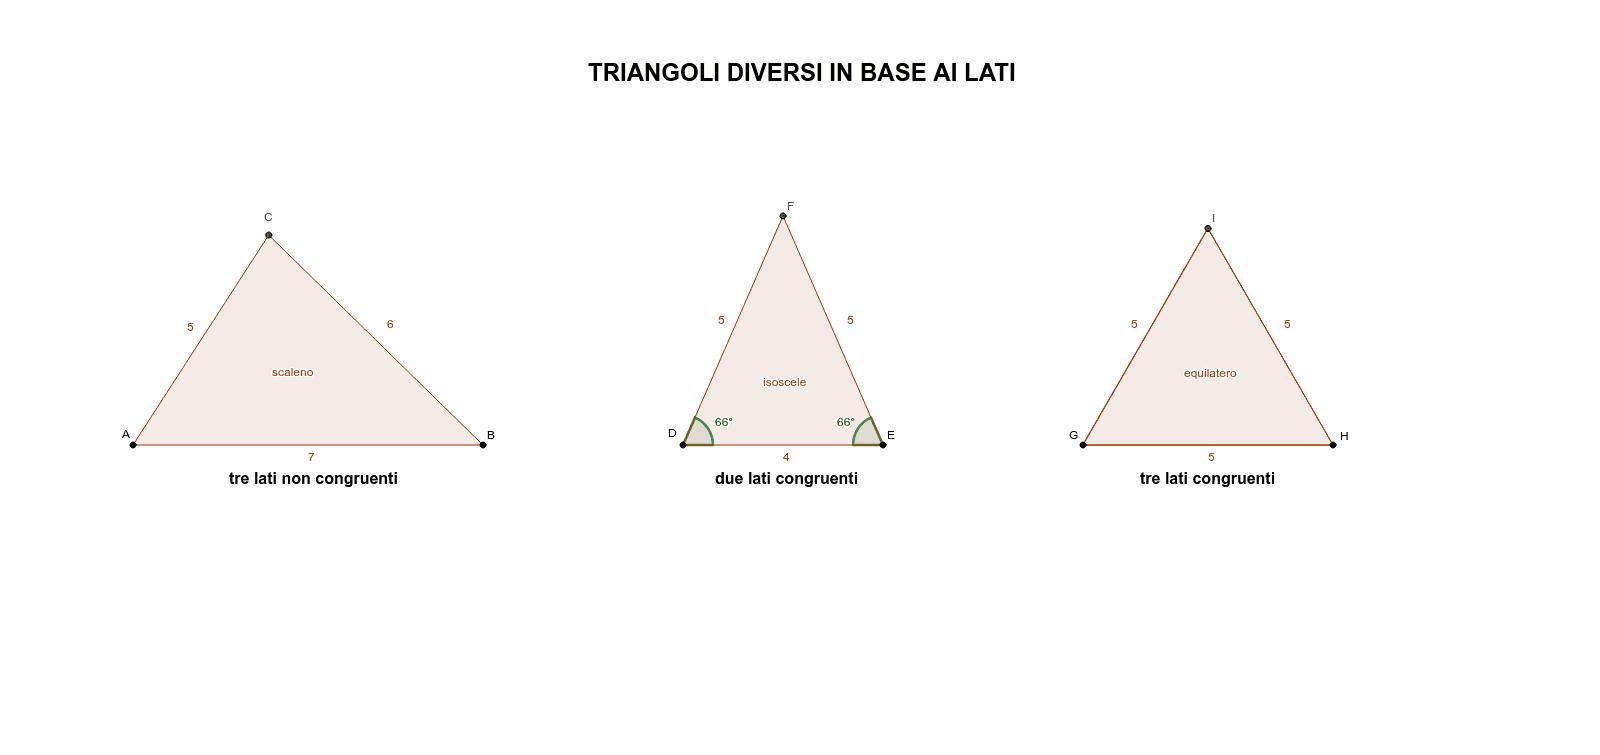 Triangoli diversi in base ai lati